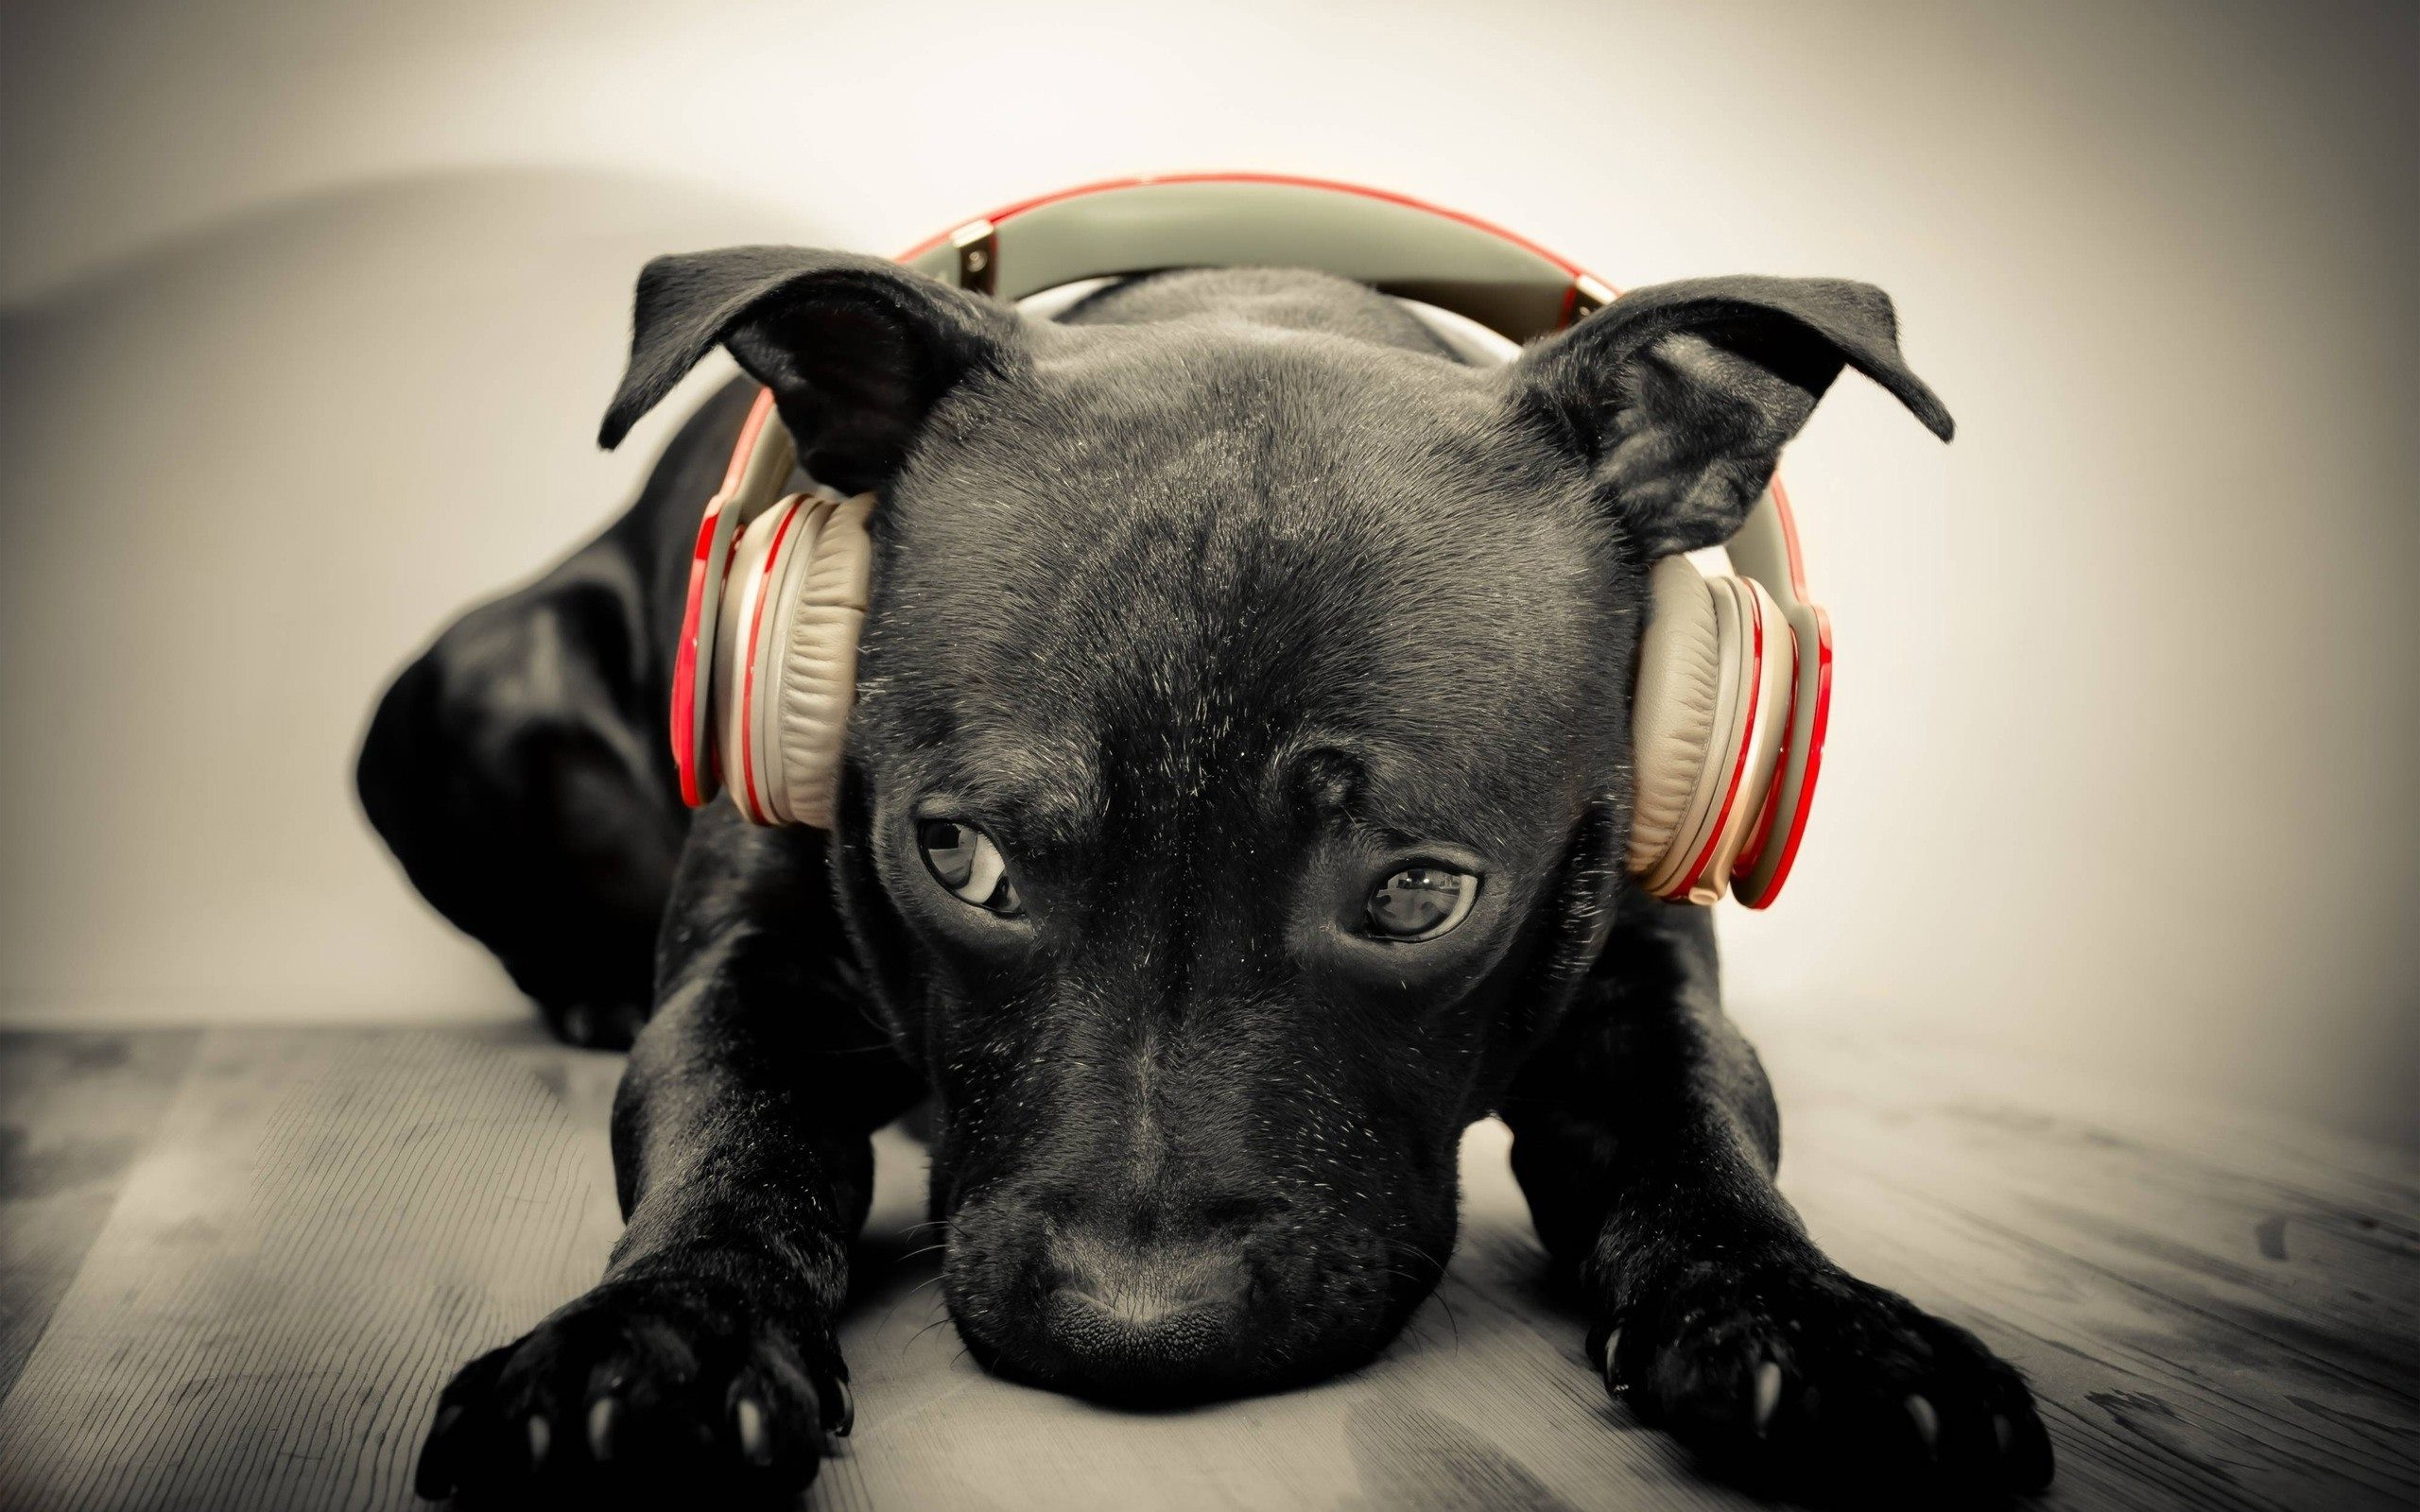 Headphones and Animals Wallpaper 1080p